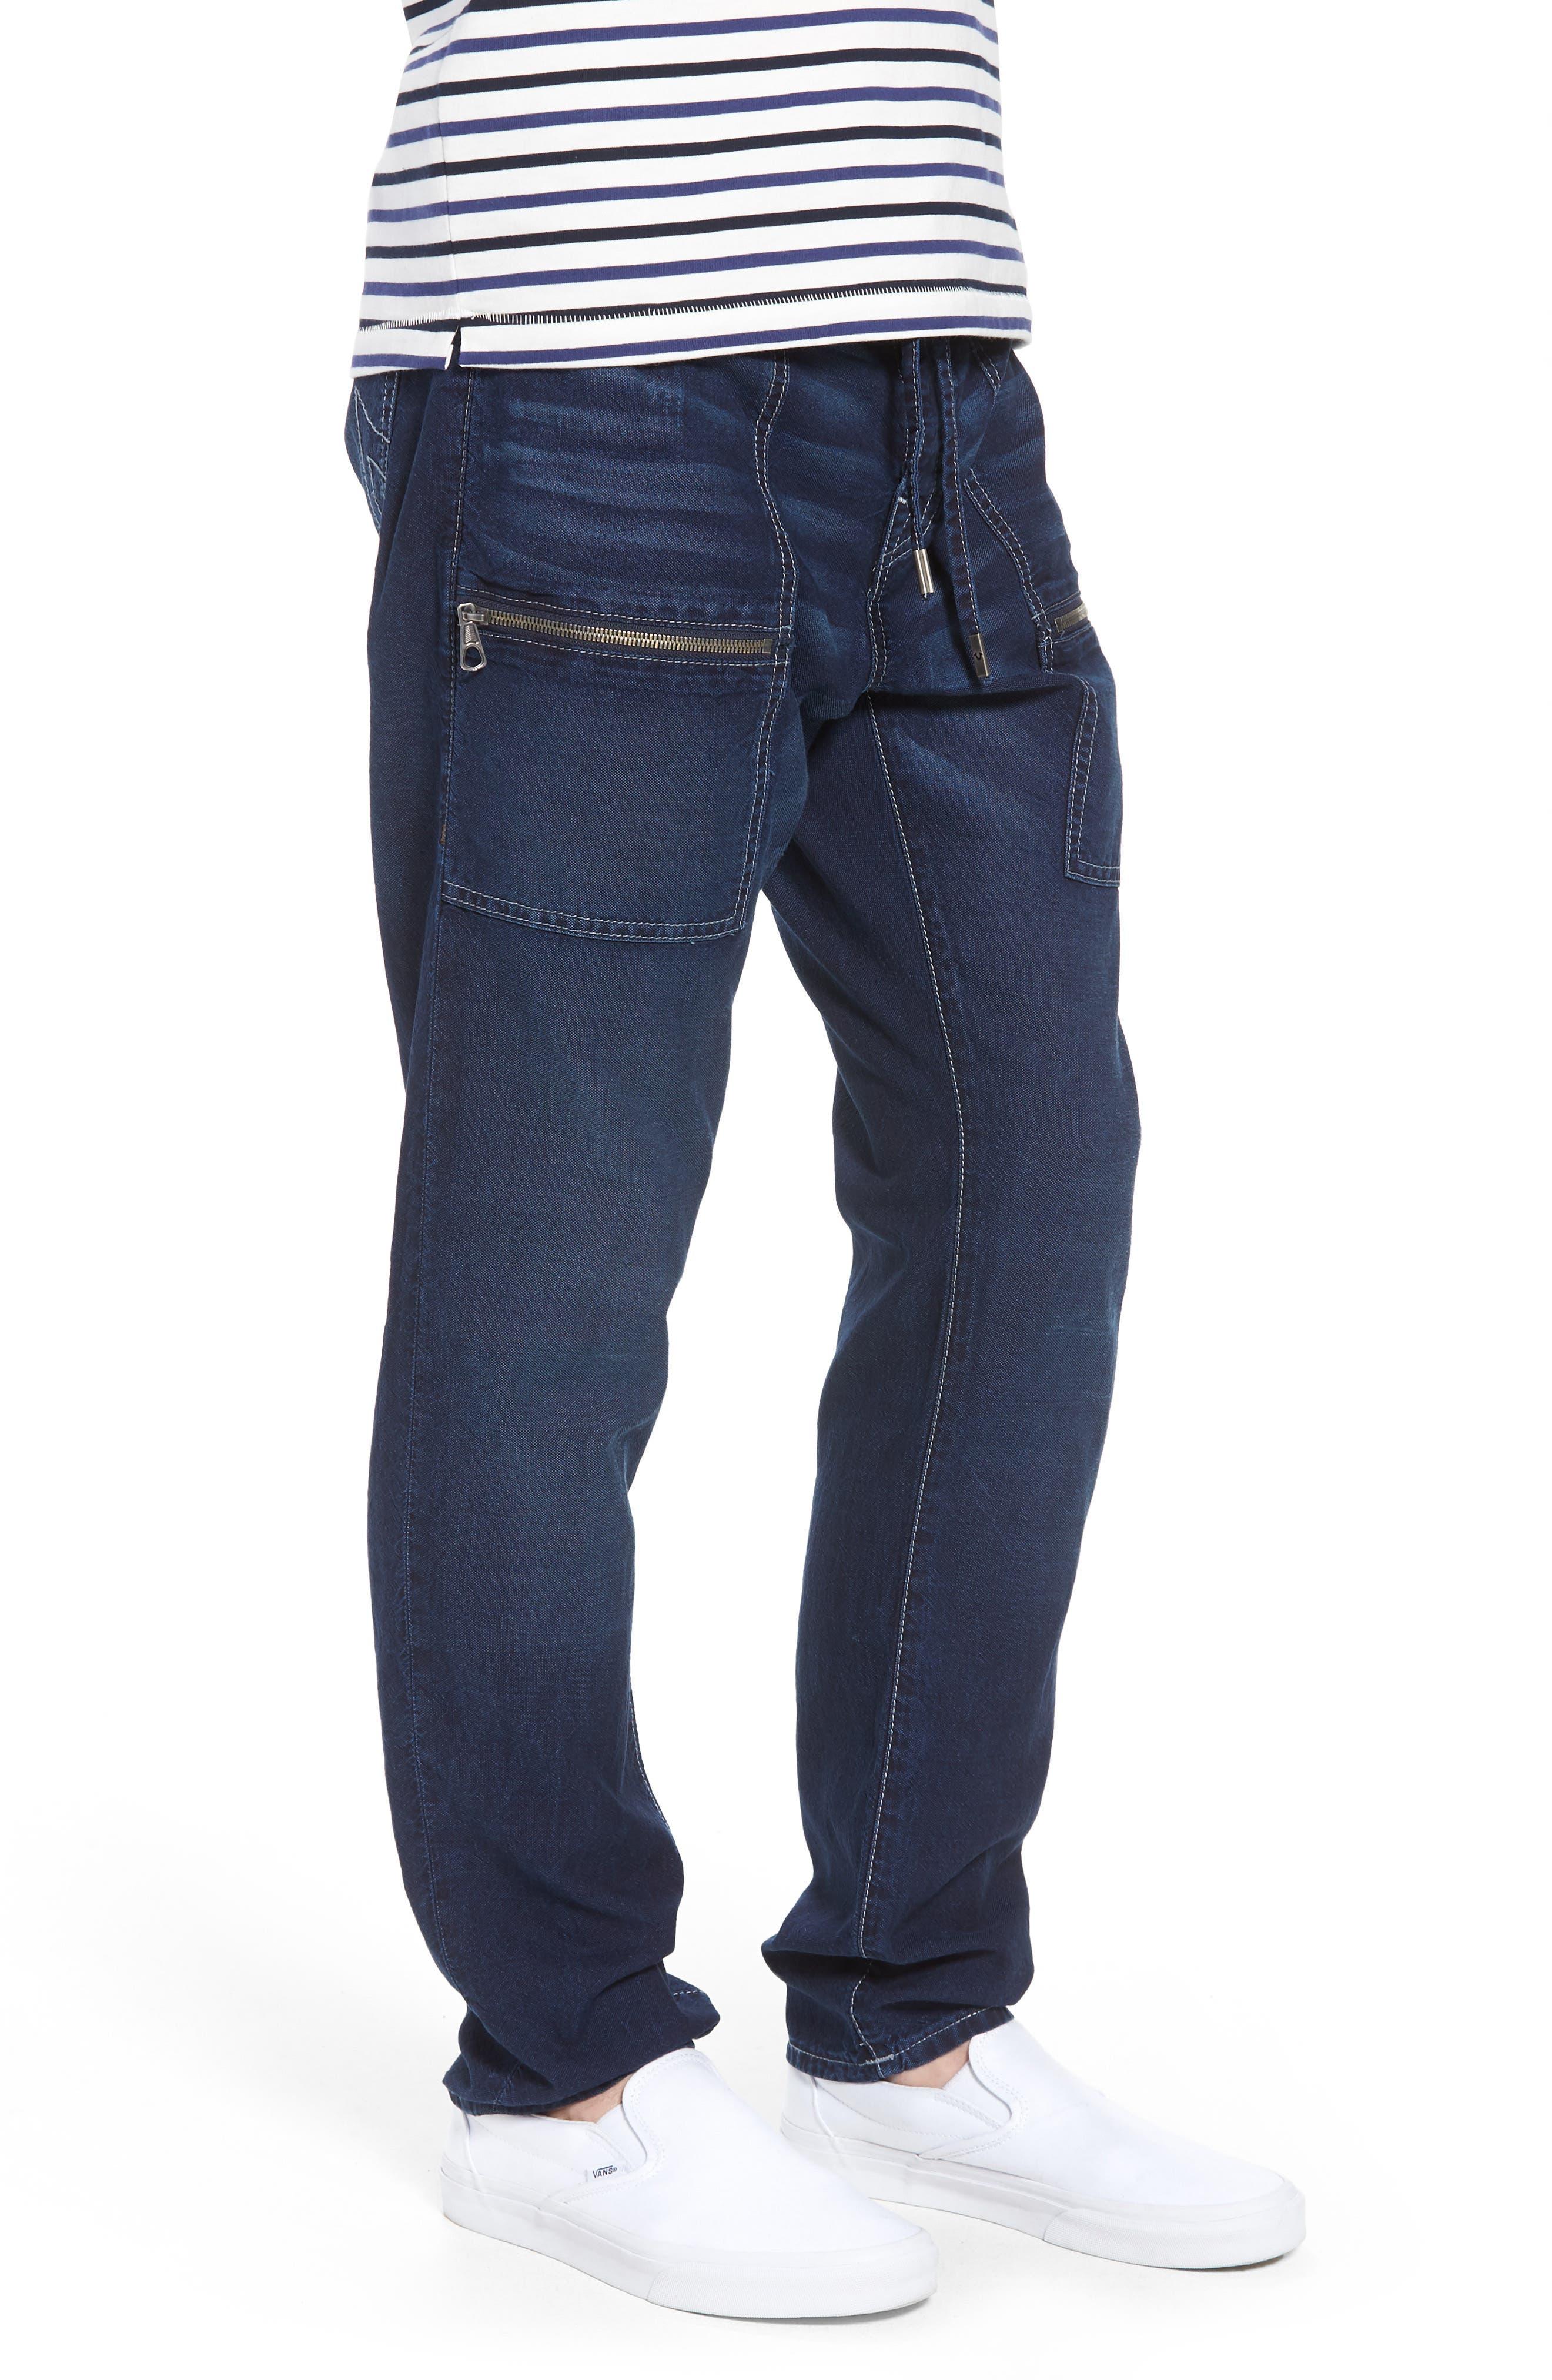 Trail Utility Jeans,                             Alternate thumbnail 3, color,                             UNION SPECIAL